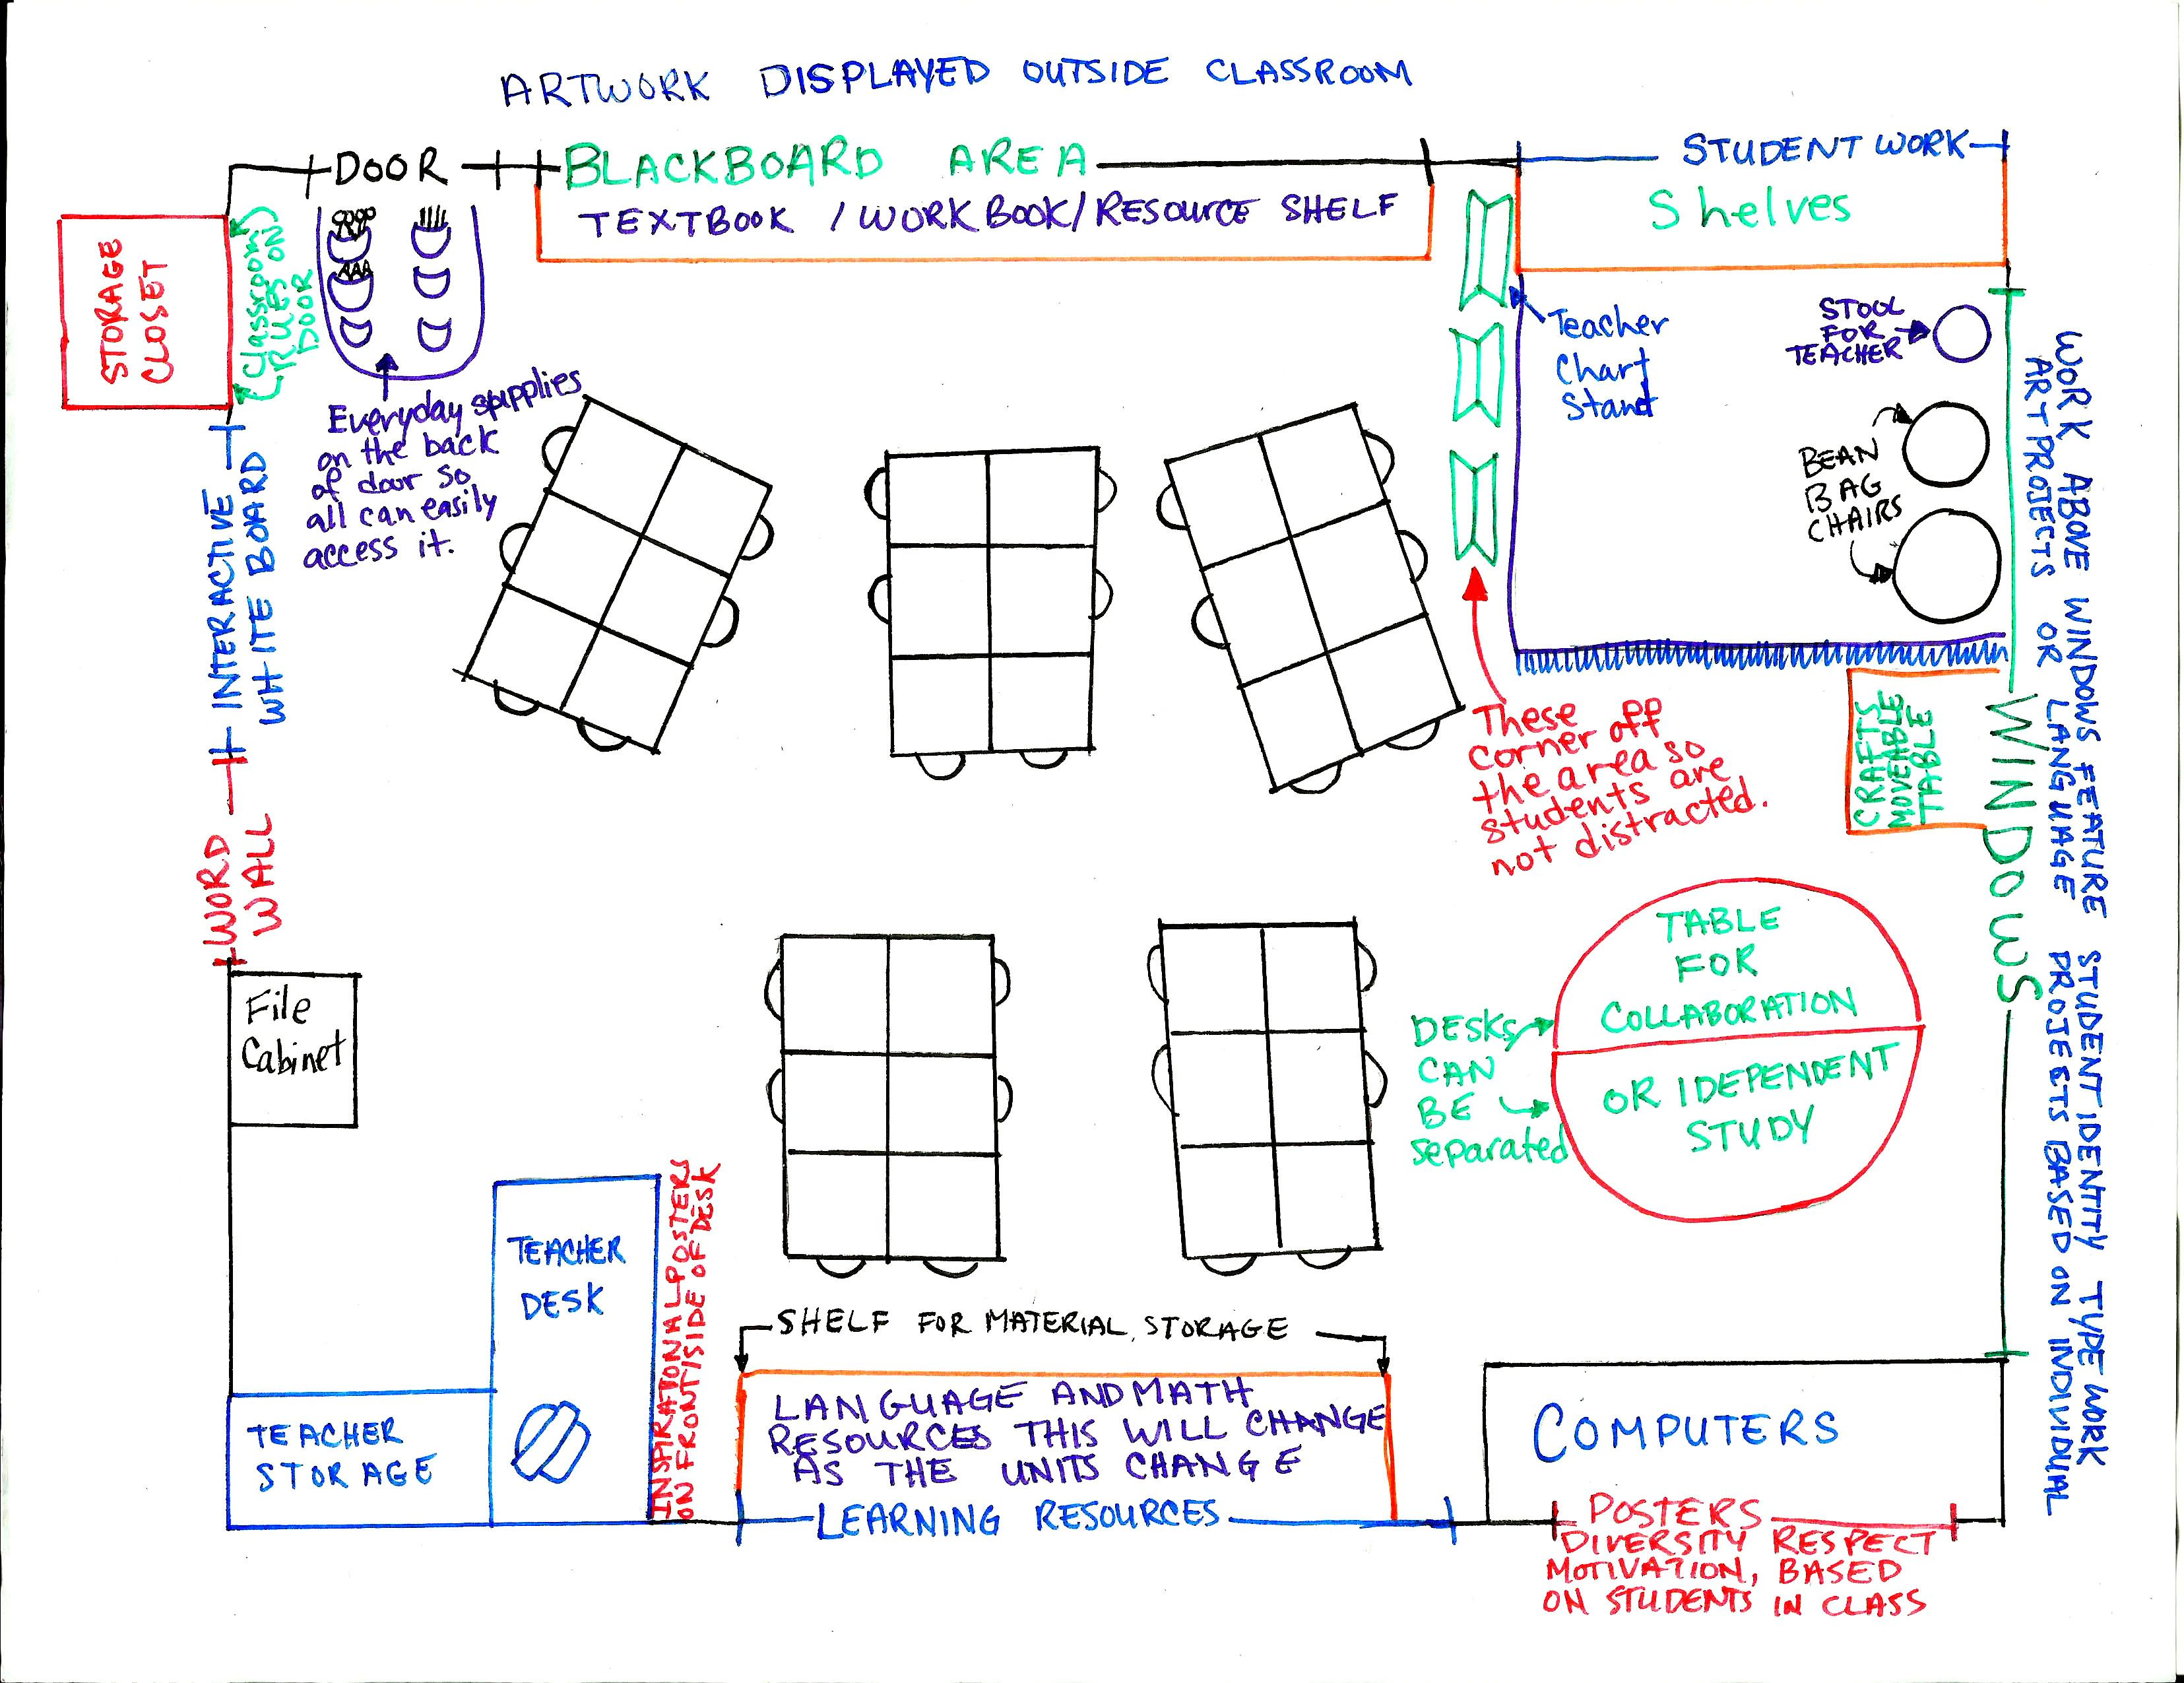 Preschool Classroom Design Standards : Udl classroom layout the link is https s media cache